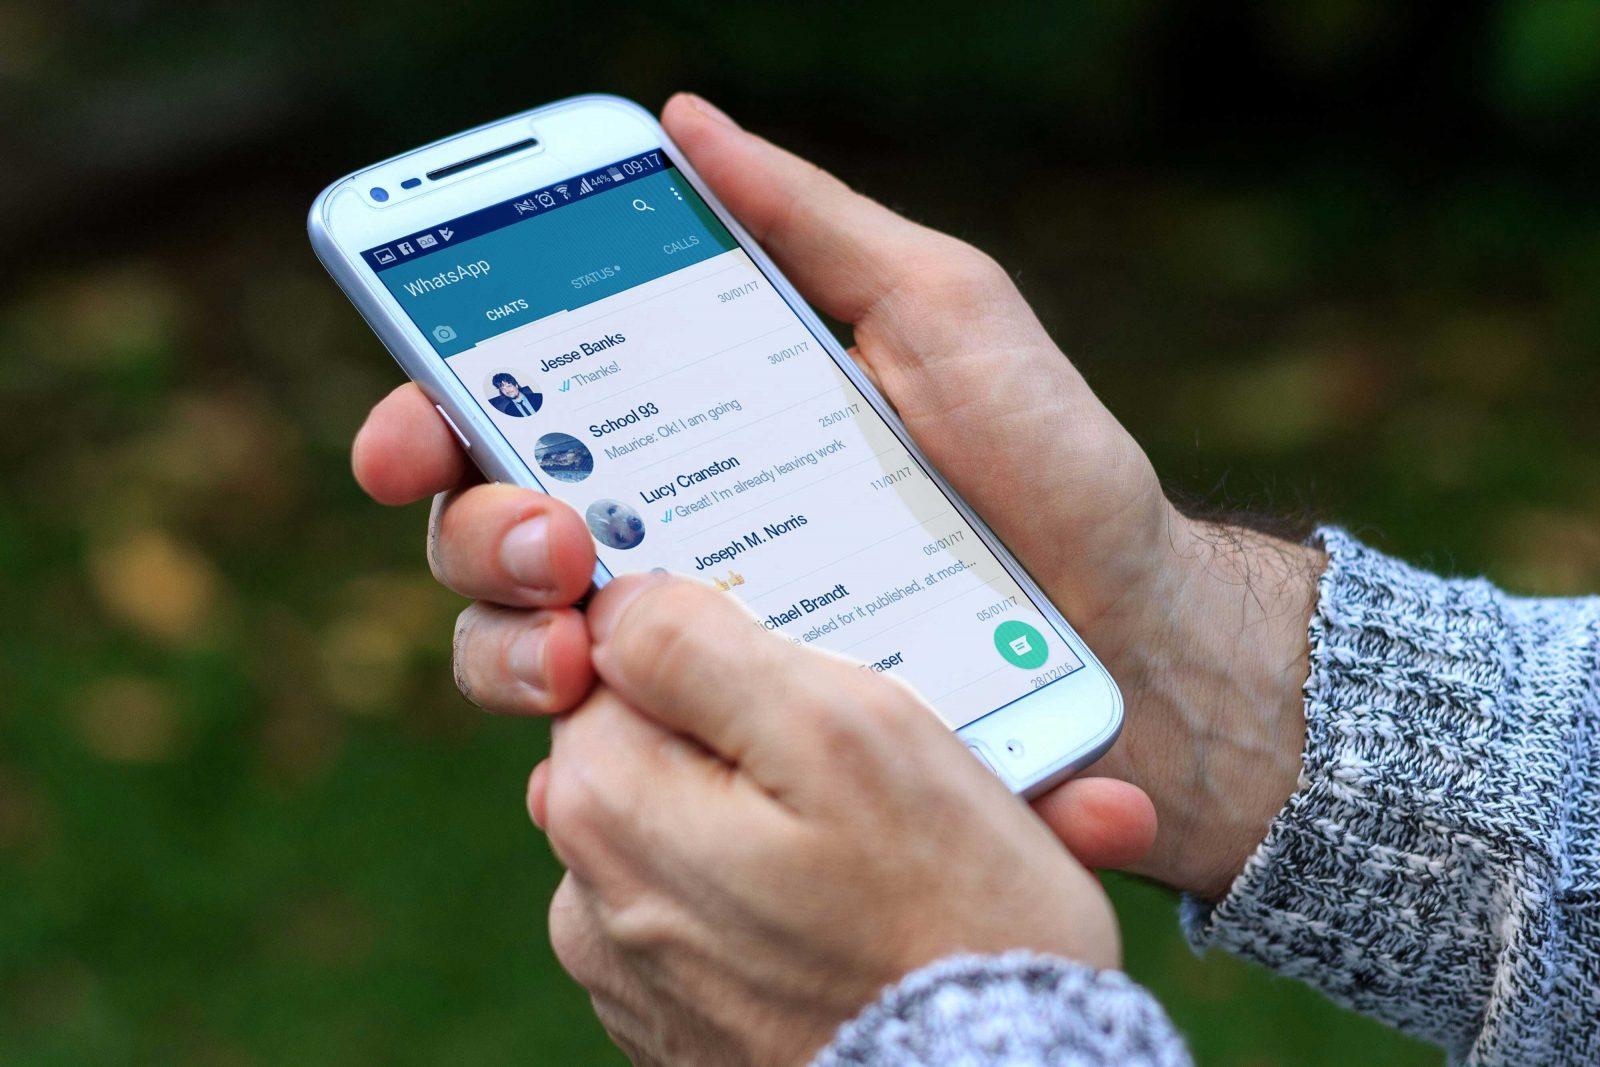 Список контактов на смартфоне